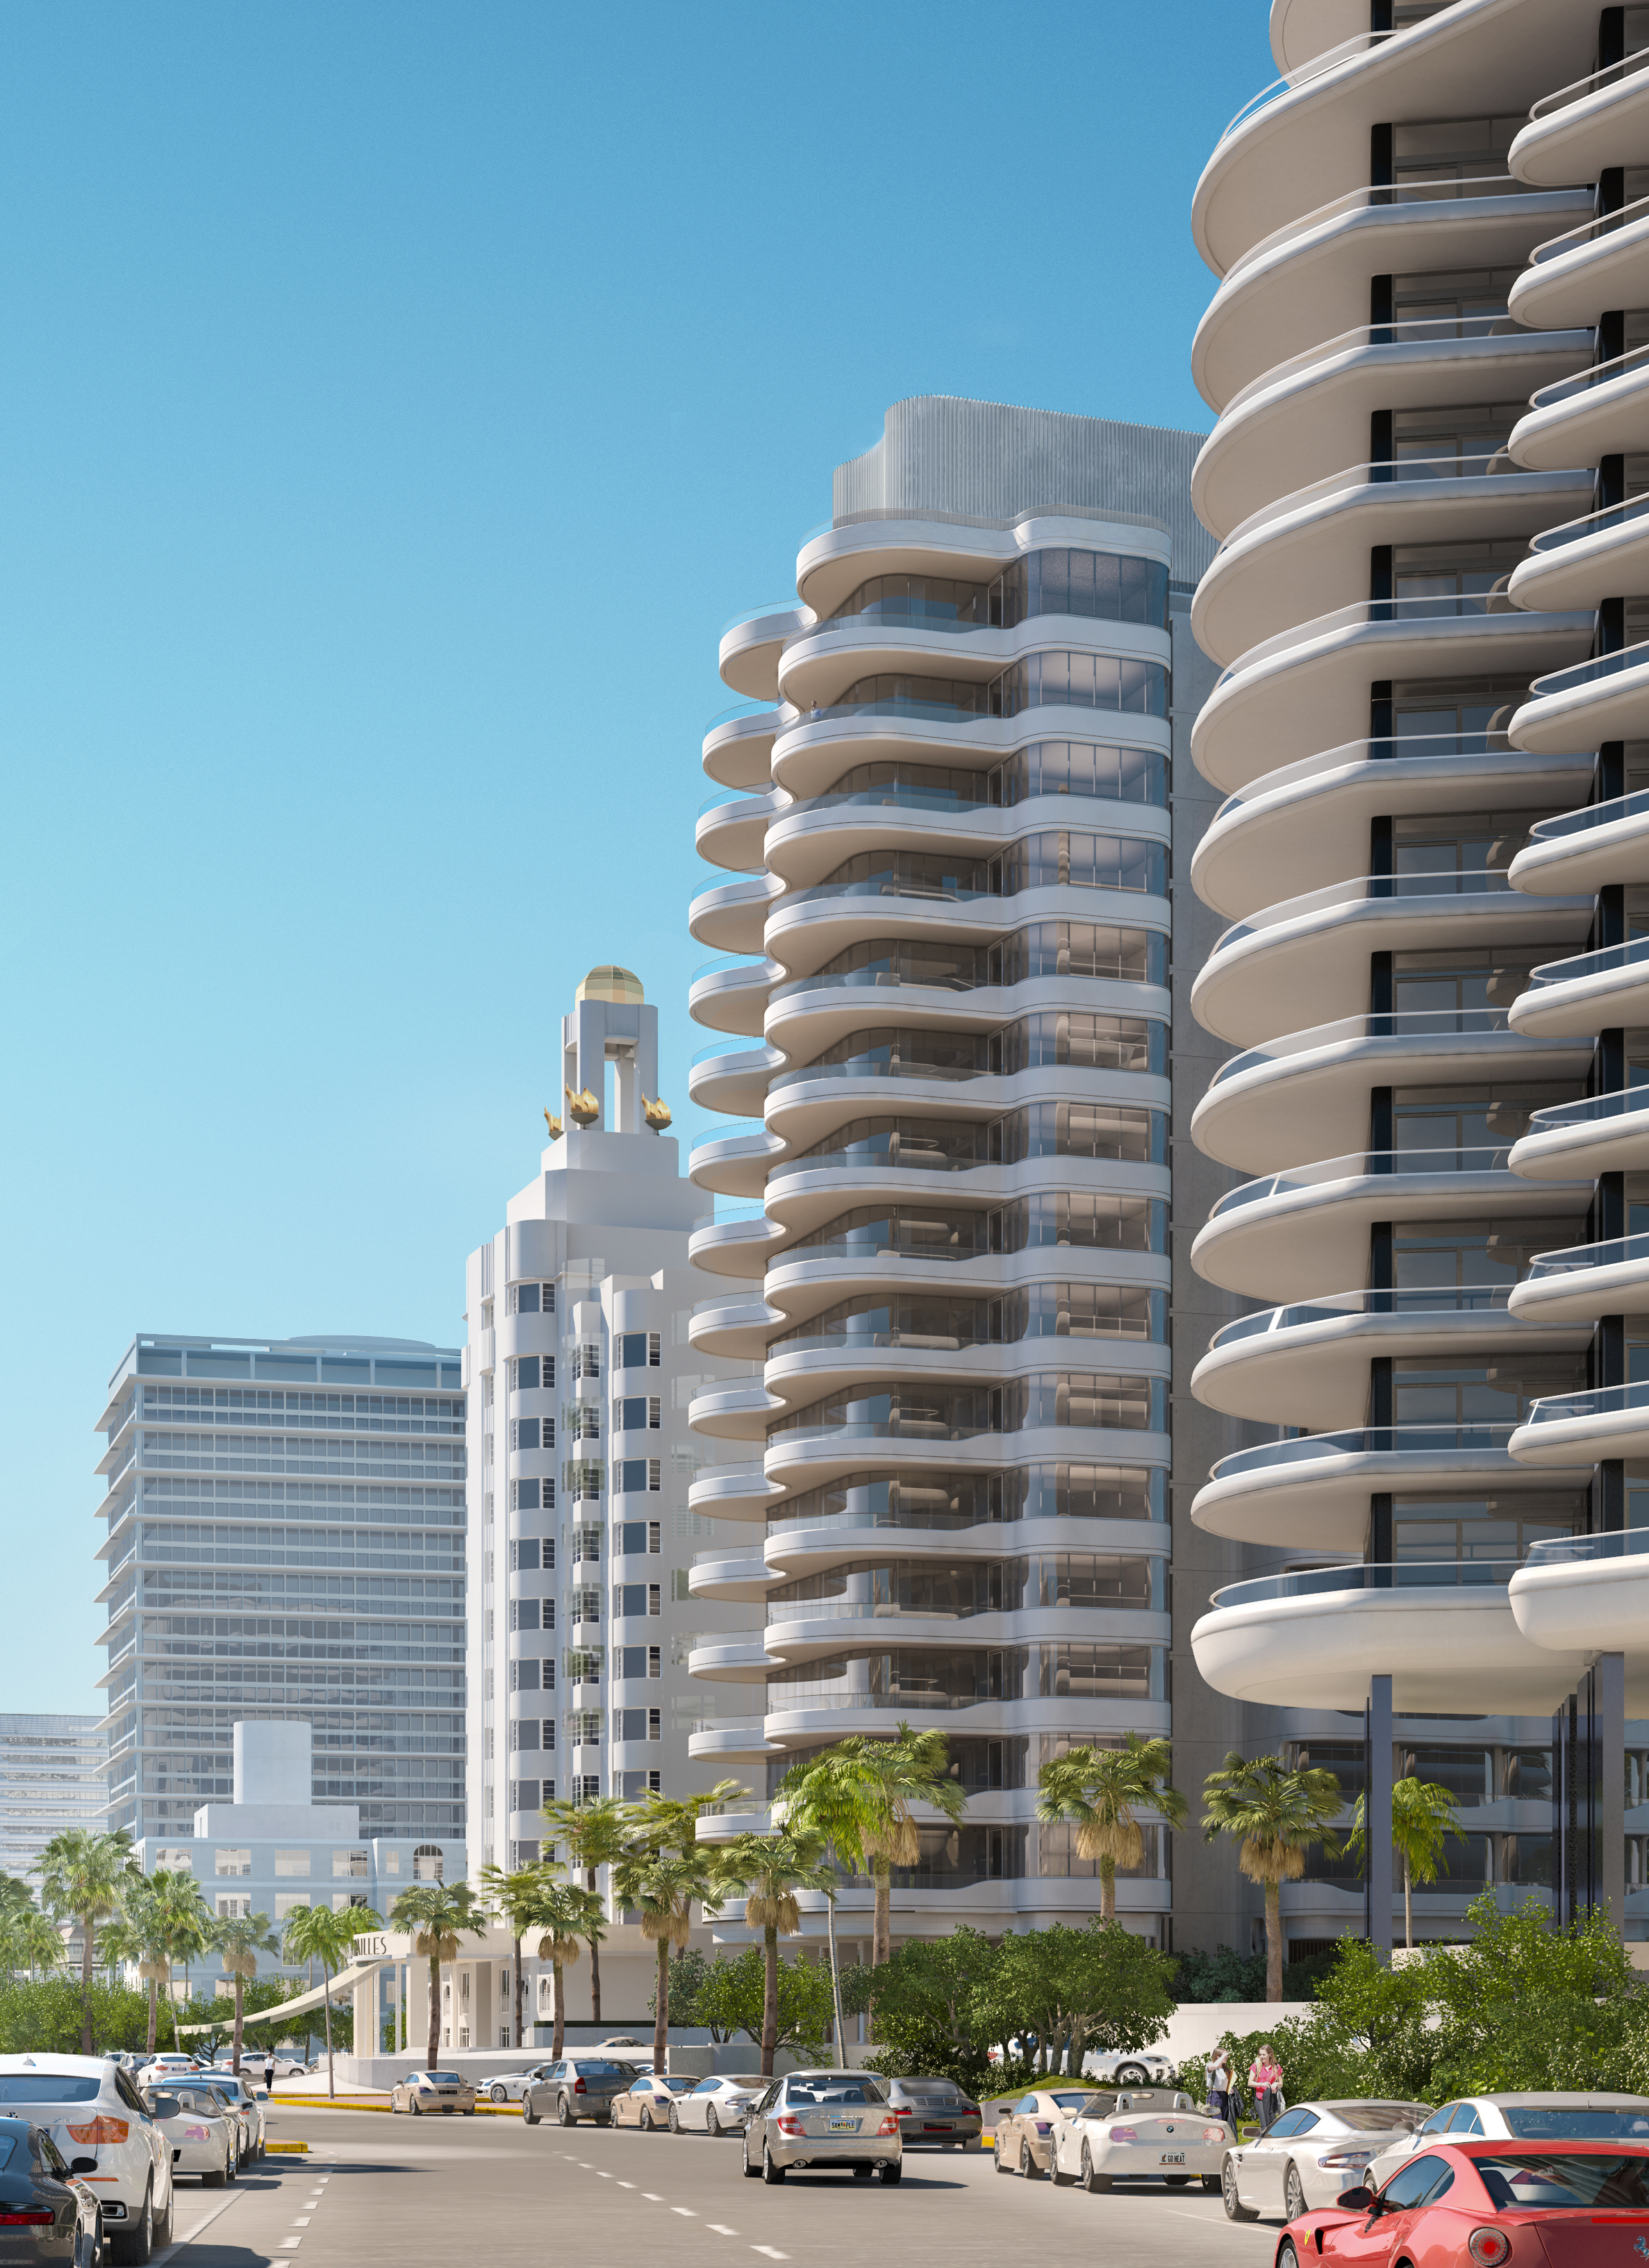 Brandon Haw took inspiration from Miami's art deco past for Faena Mar, a luxury condominium in the Faena District.